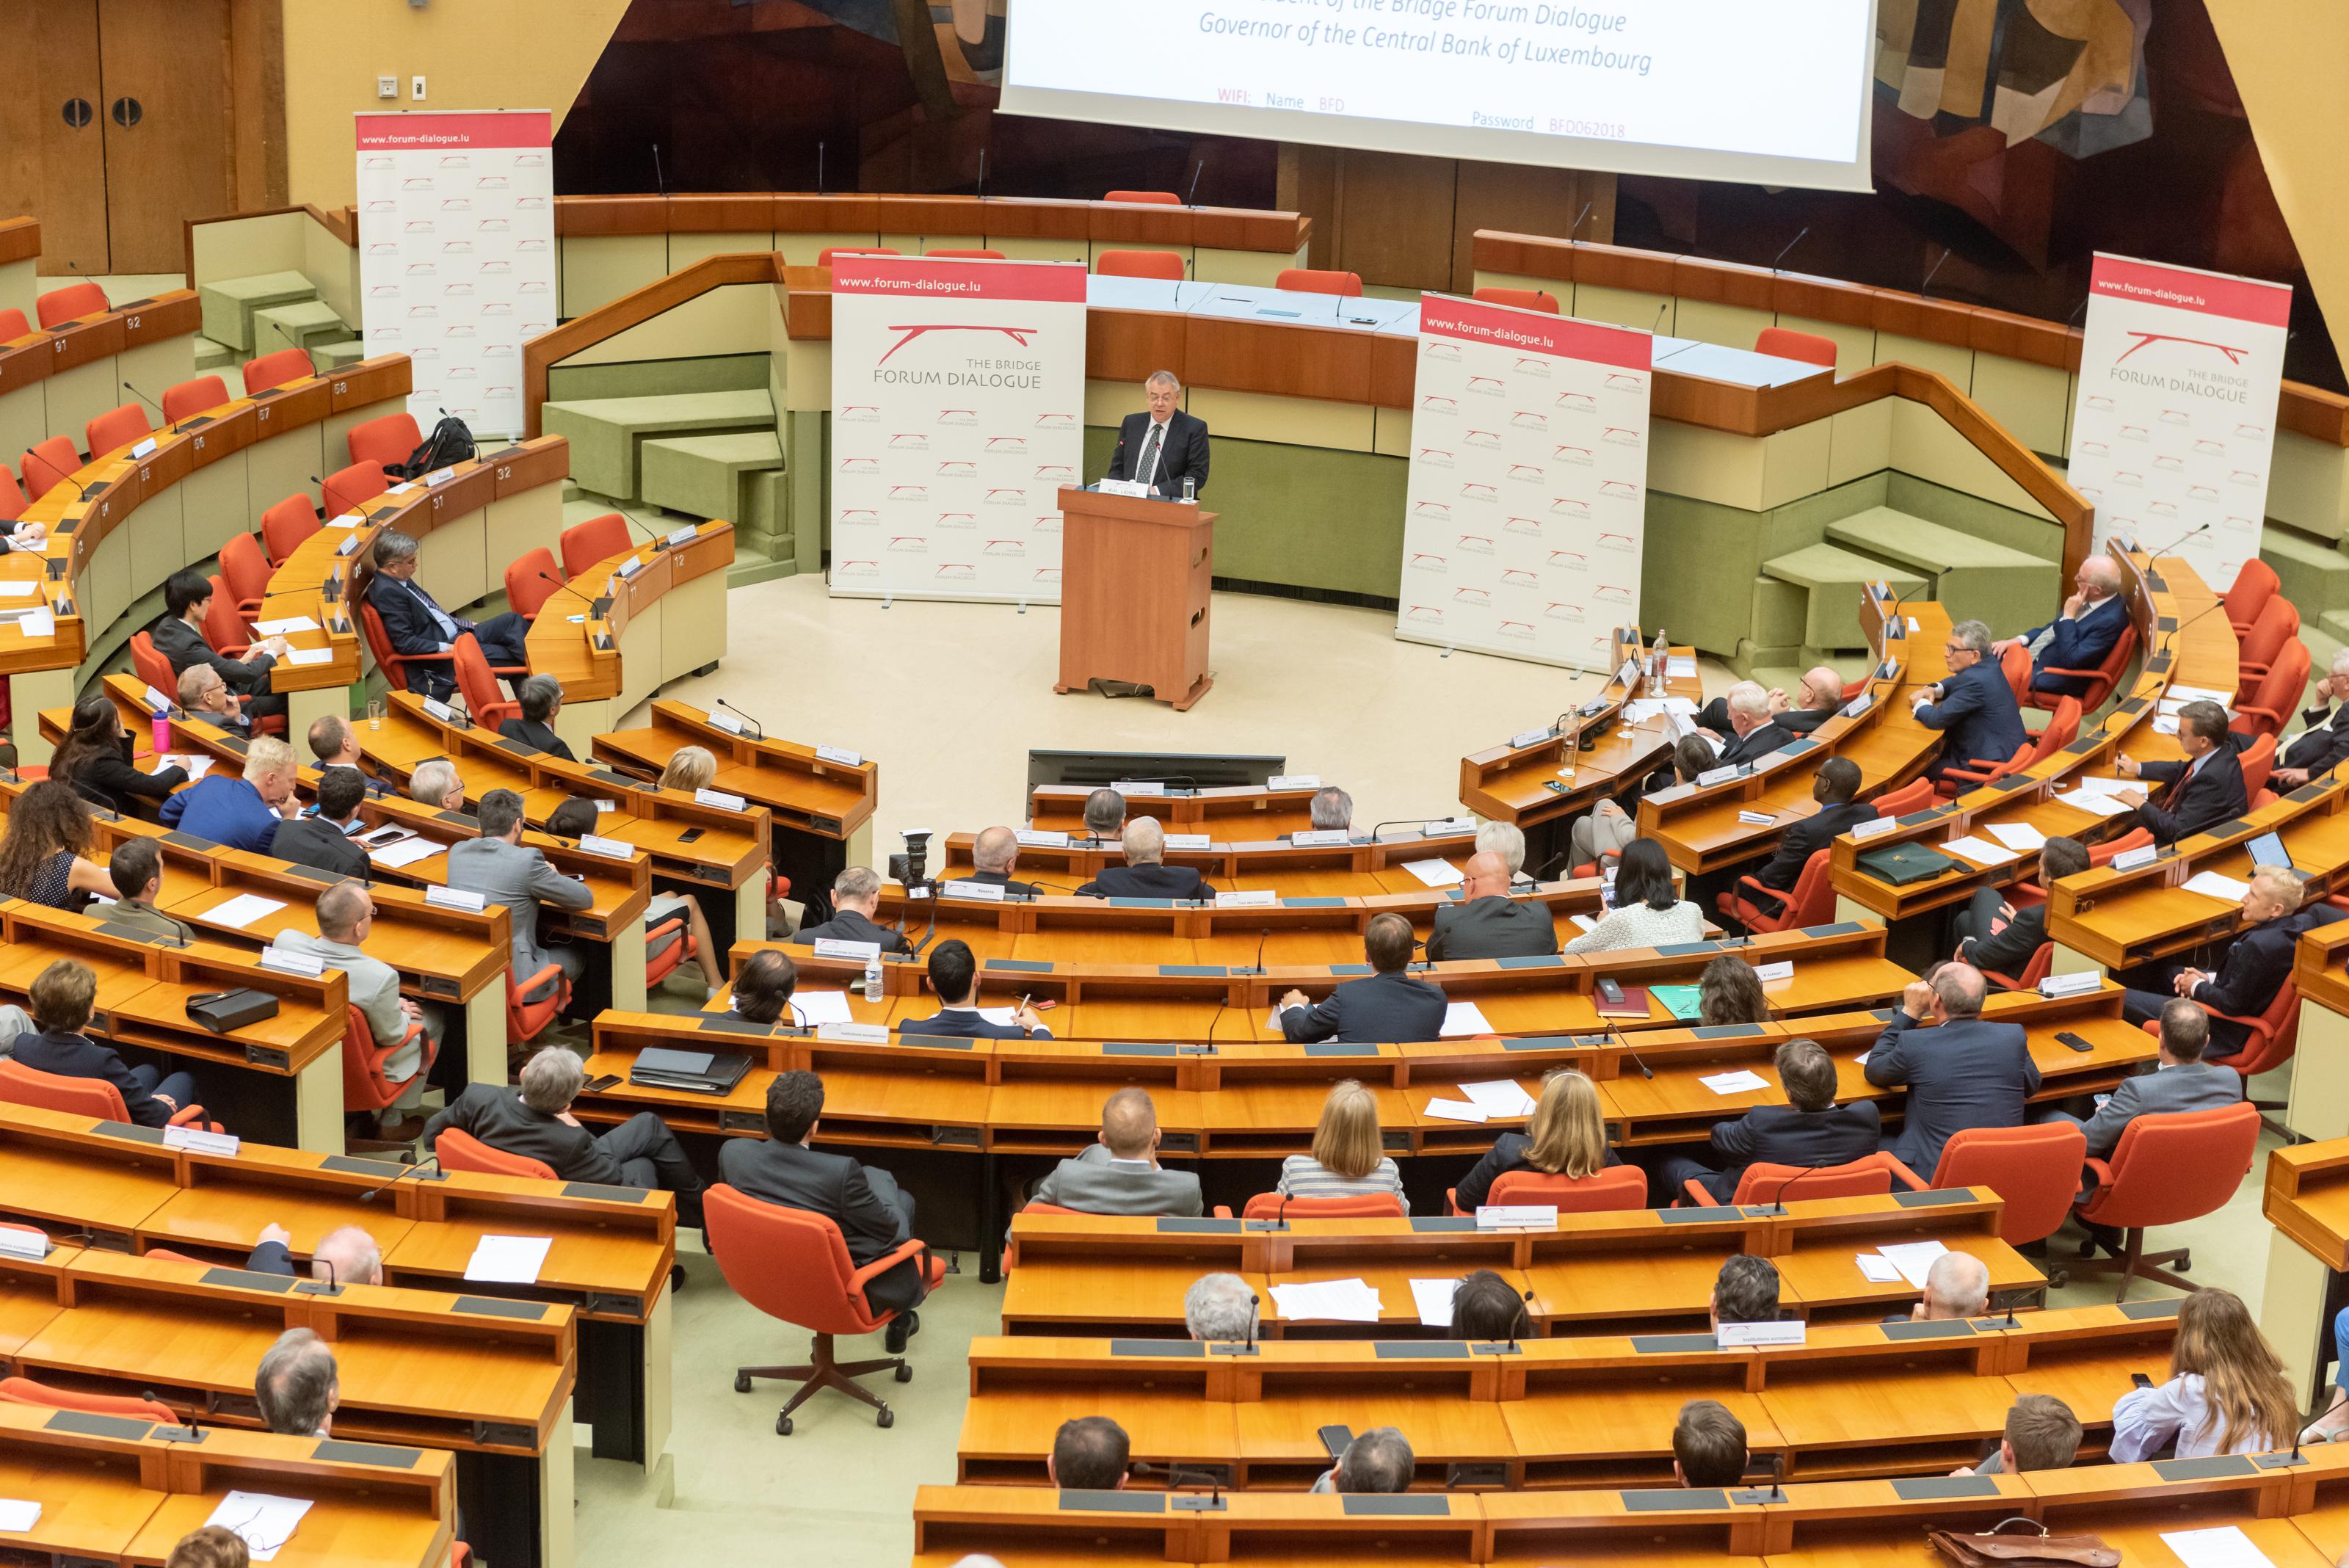 the european court of auditors  advocate of the tax payer  u2013 bridge forum dialogue